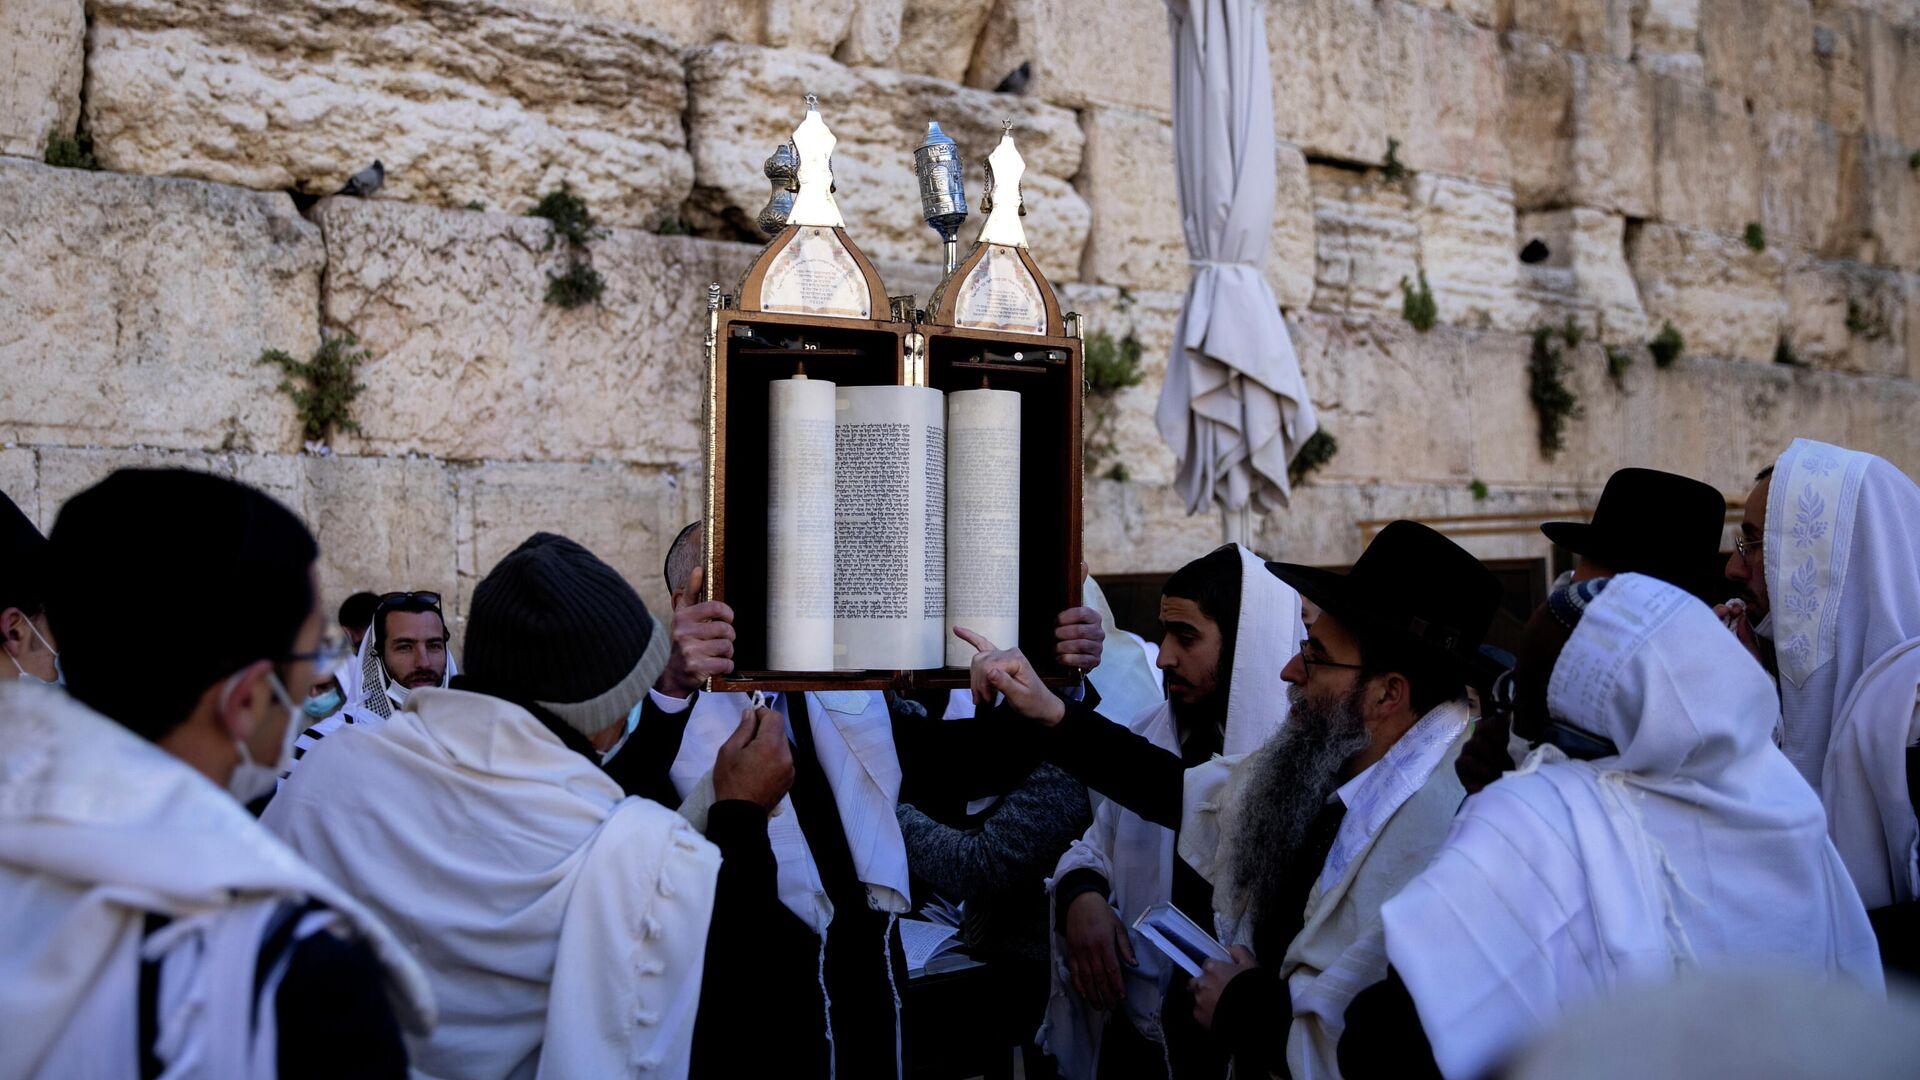 La ceremonia de Pascua judía en Jerusalén  - Sputnik Mundo, 1920, 29.03.2021